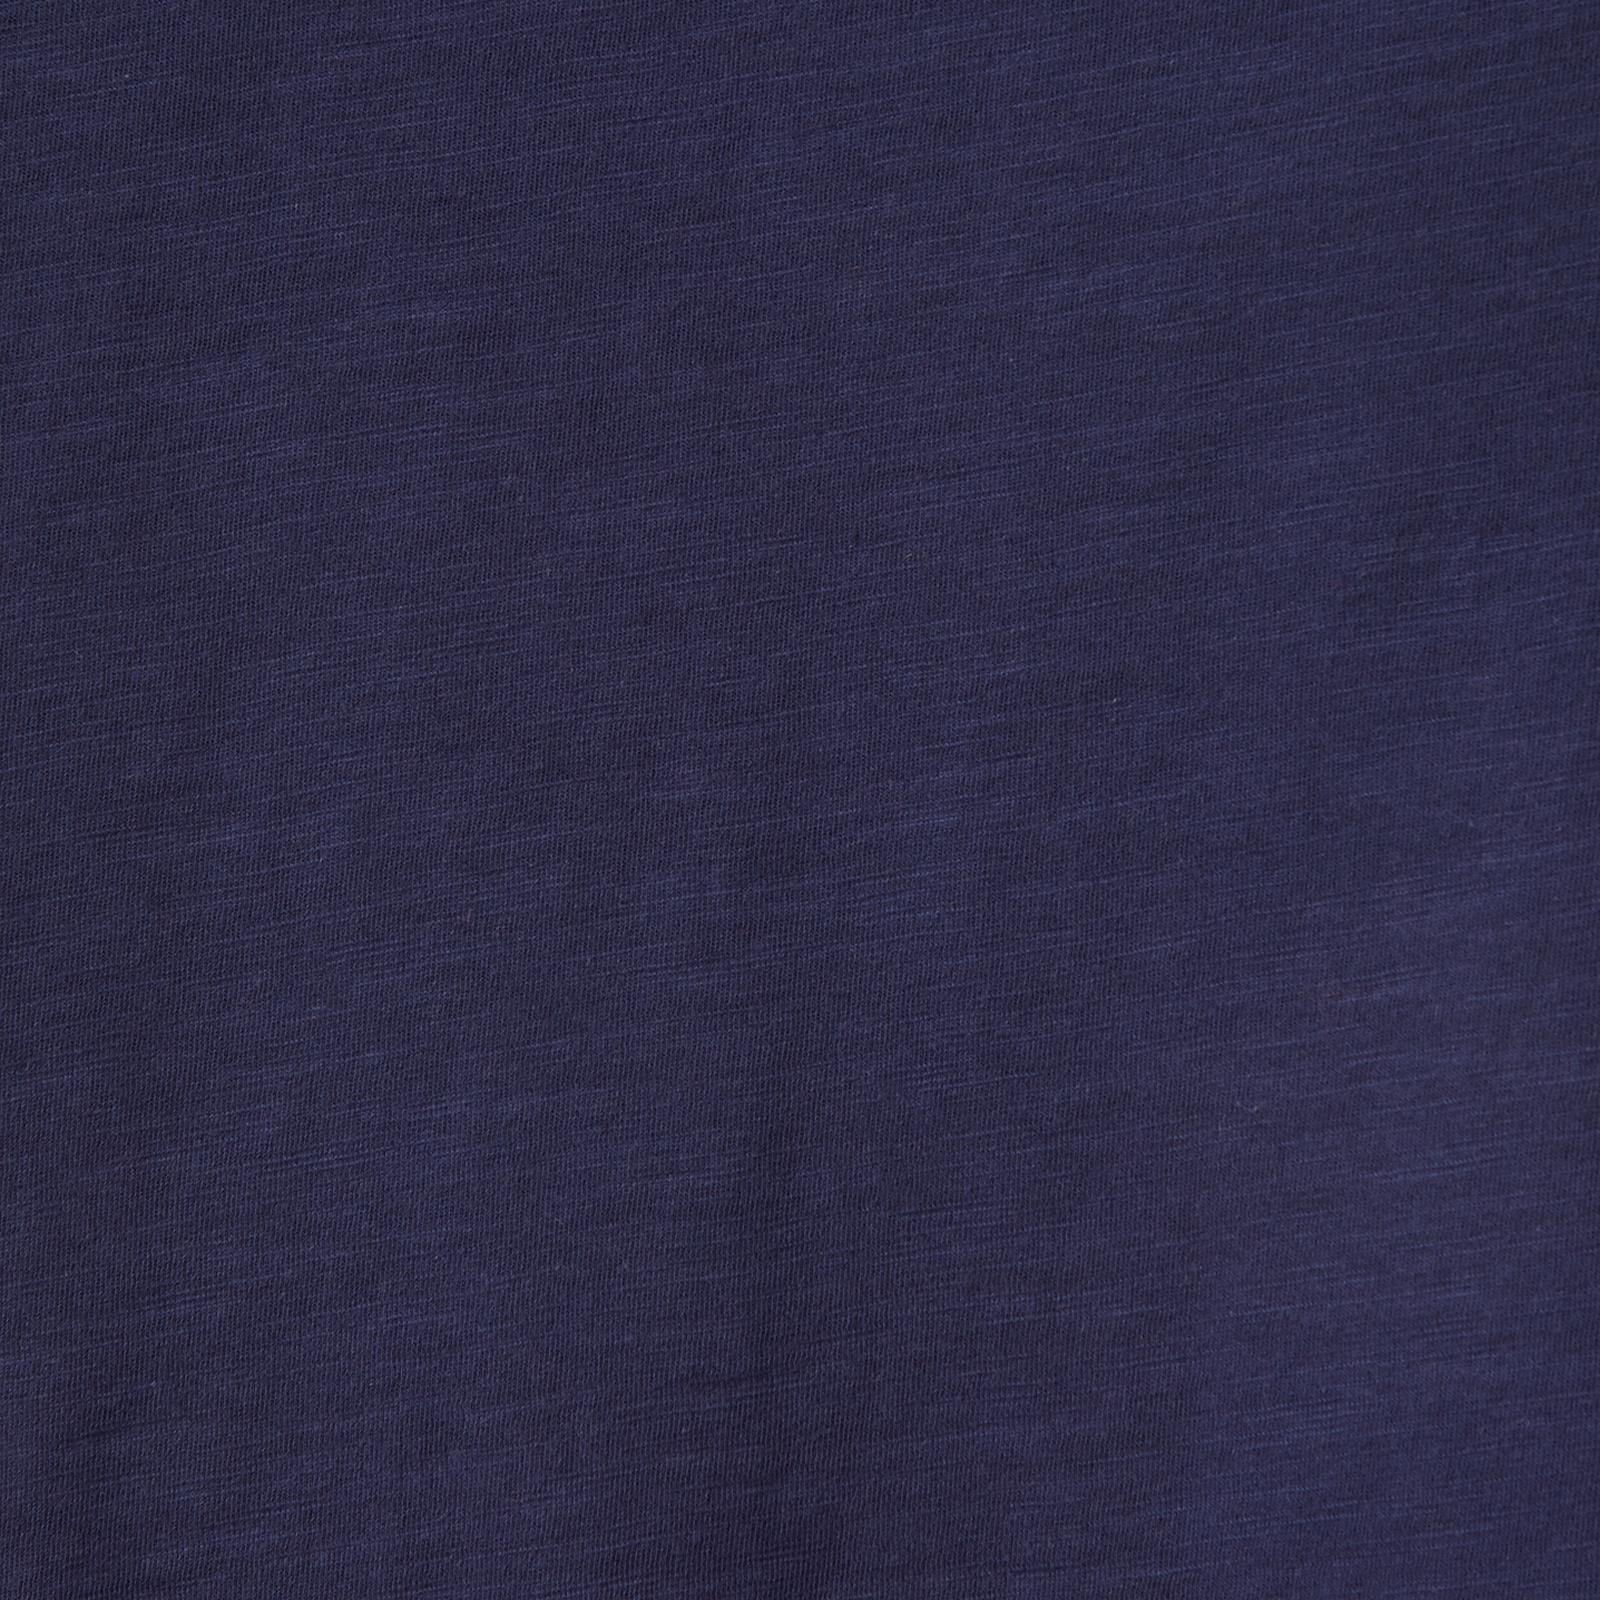 Joules-Nessa-Damas-Equitacion-Manga-corta-Jersey-Top-de-Moda-de-pais-Caminar miniatura 32